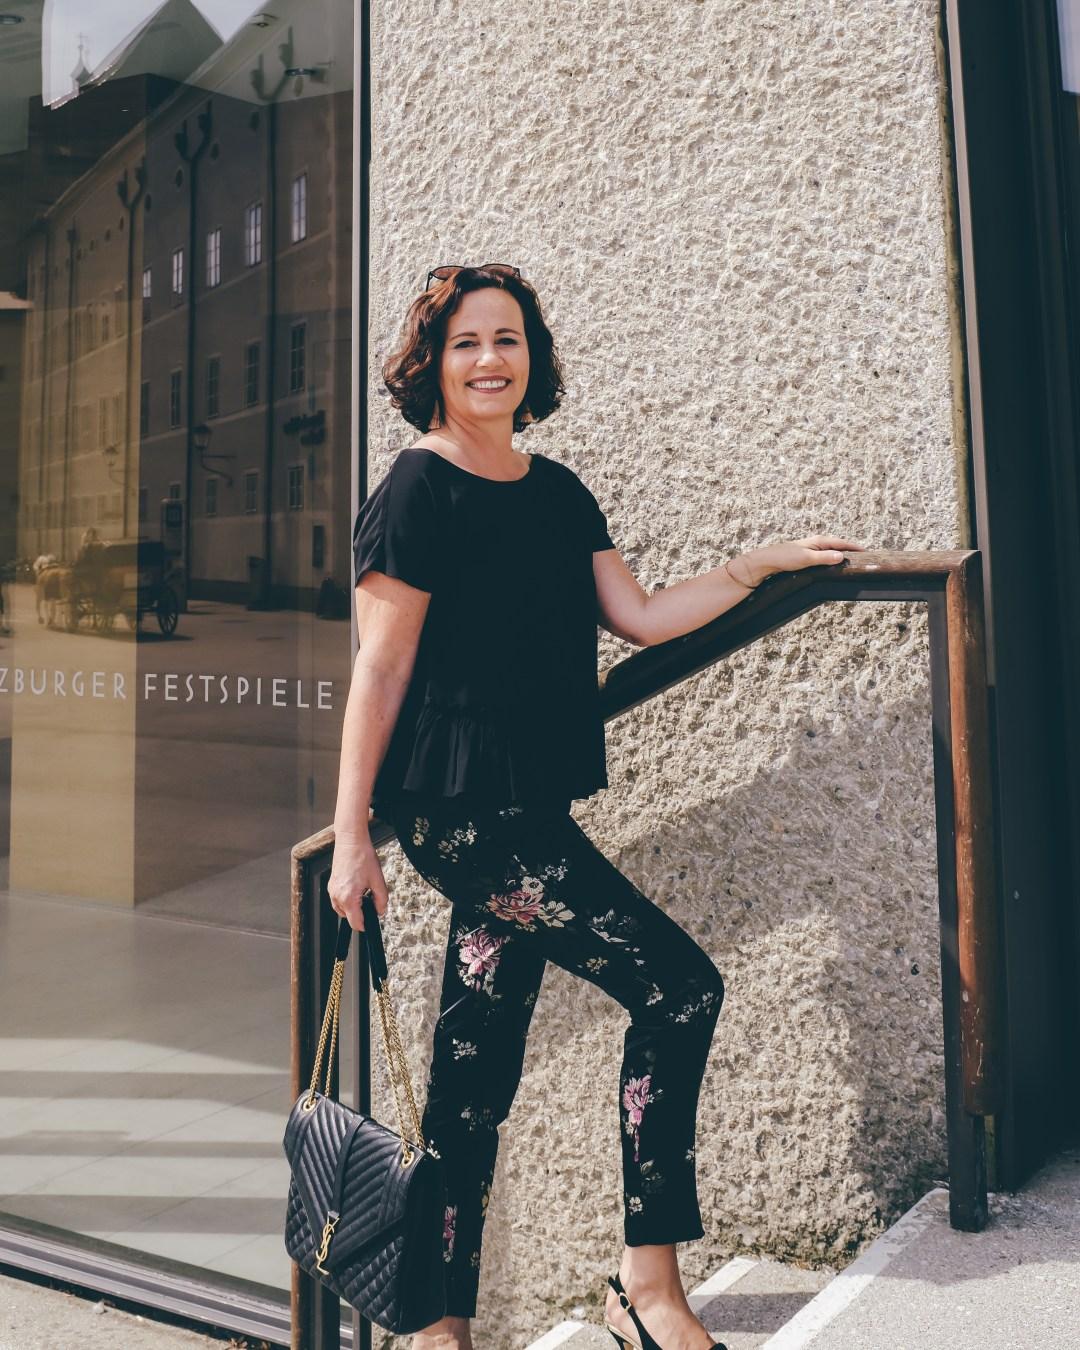 inastil, Ü50Mode, FashionÜ50, Modeberatung, Salzburg, Festspiele, Hose mit Blumenmuster, Seidenshirt, YSL Tasche Envelope, Slingback Pumps, elegant, Sale-8